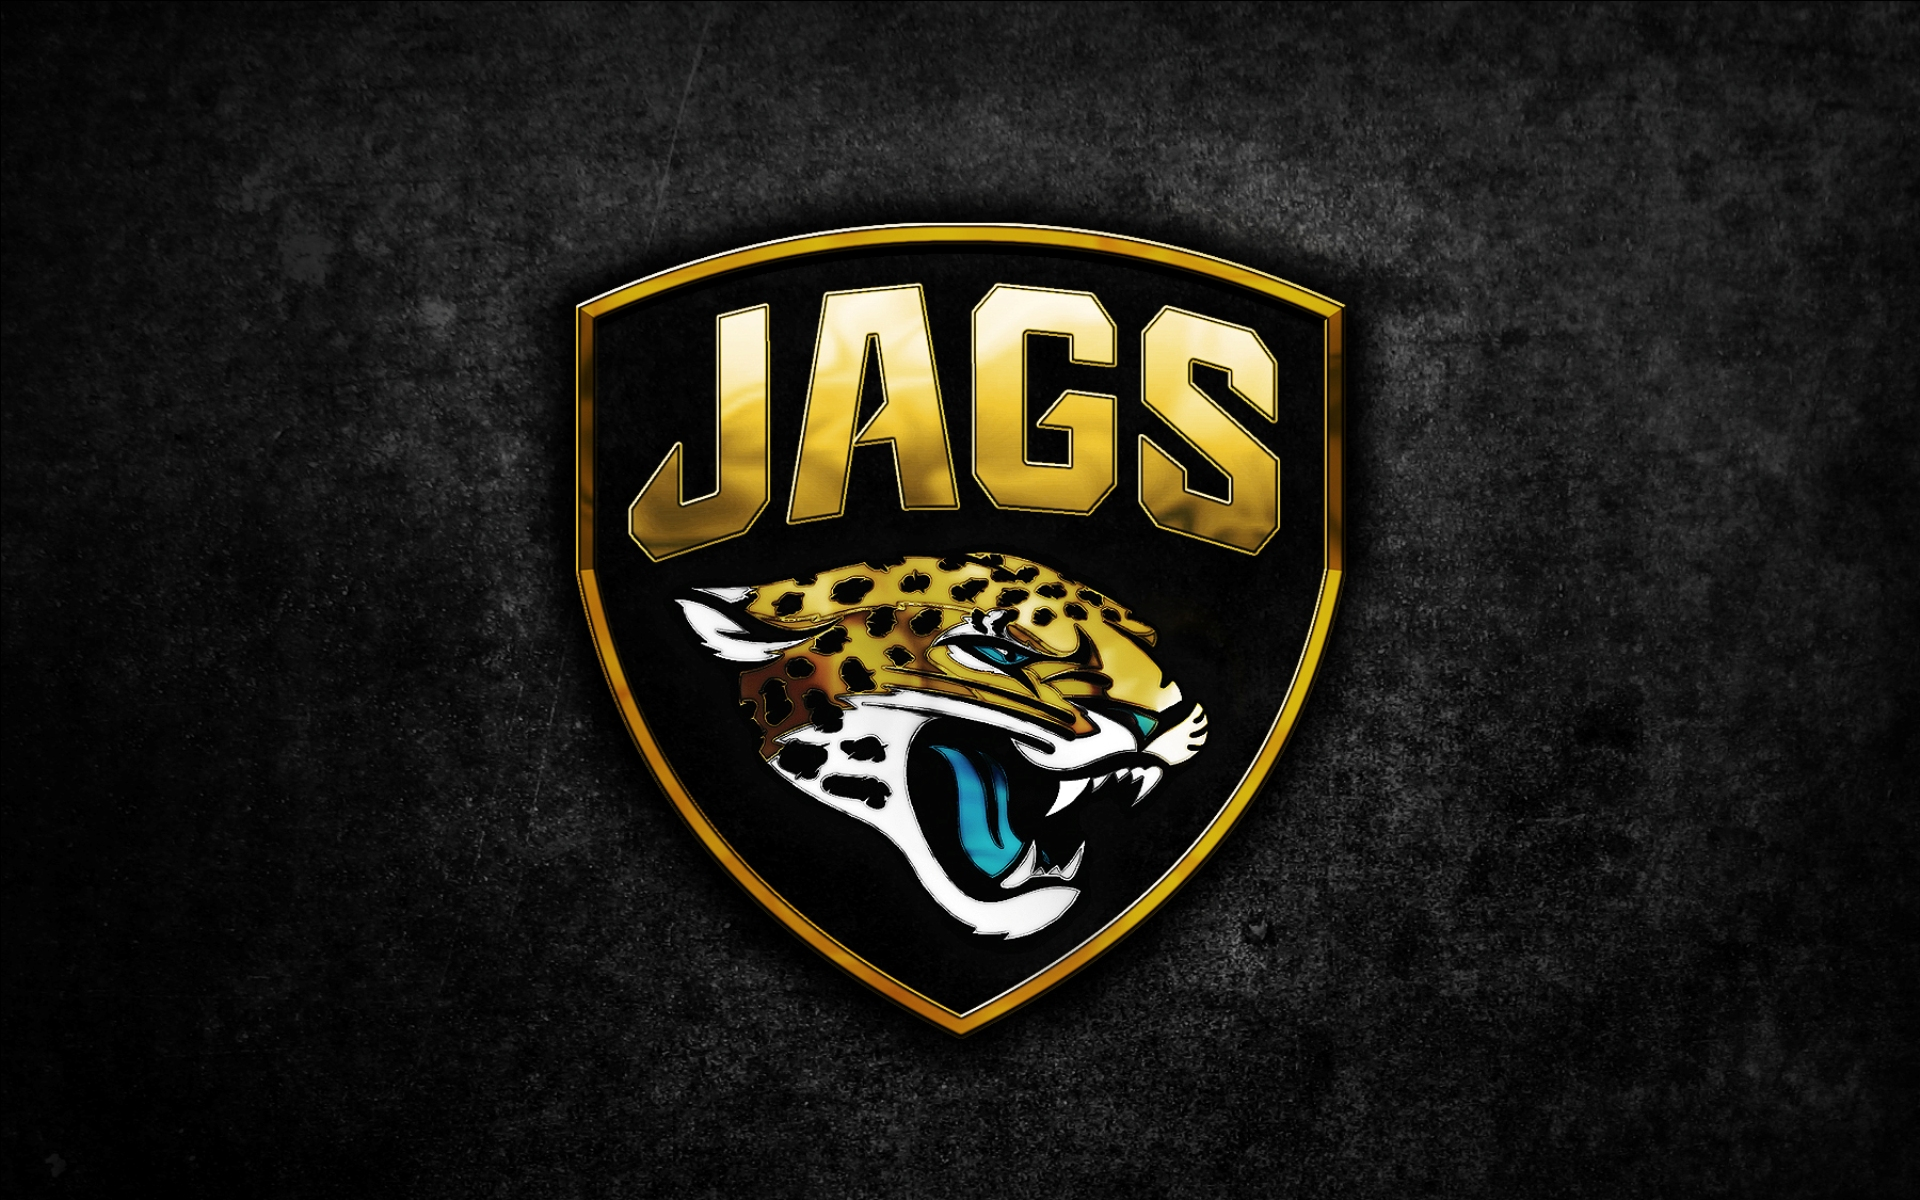 Jacksonville Jaguars Logo 2013 1920x1200